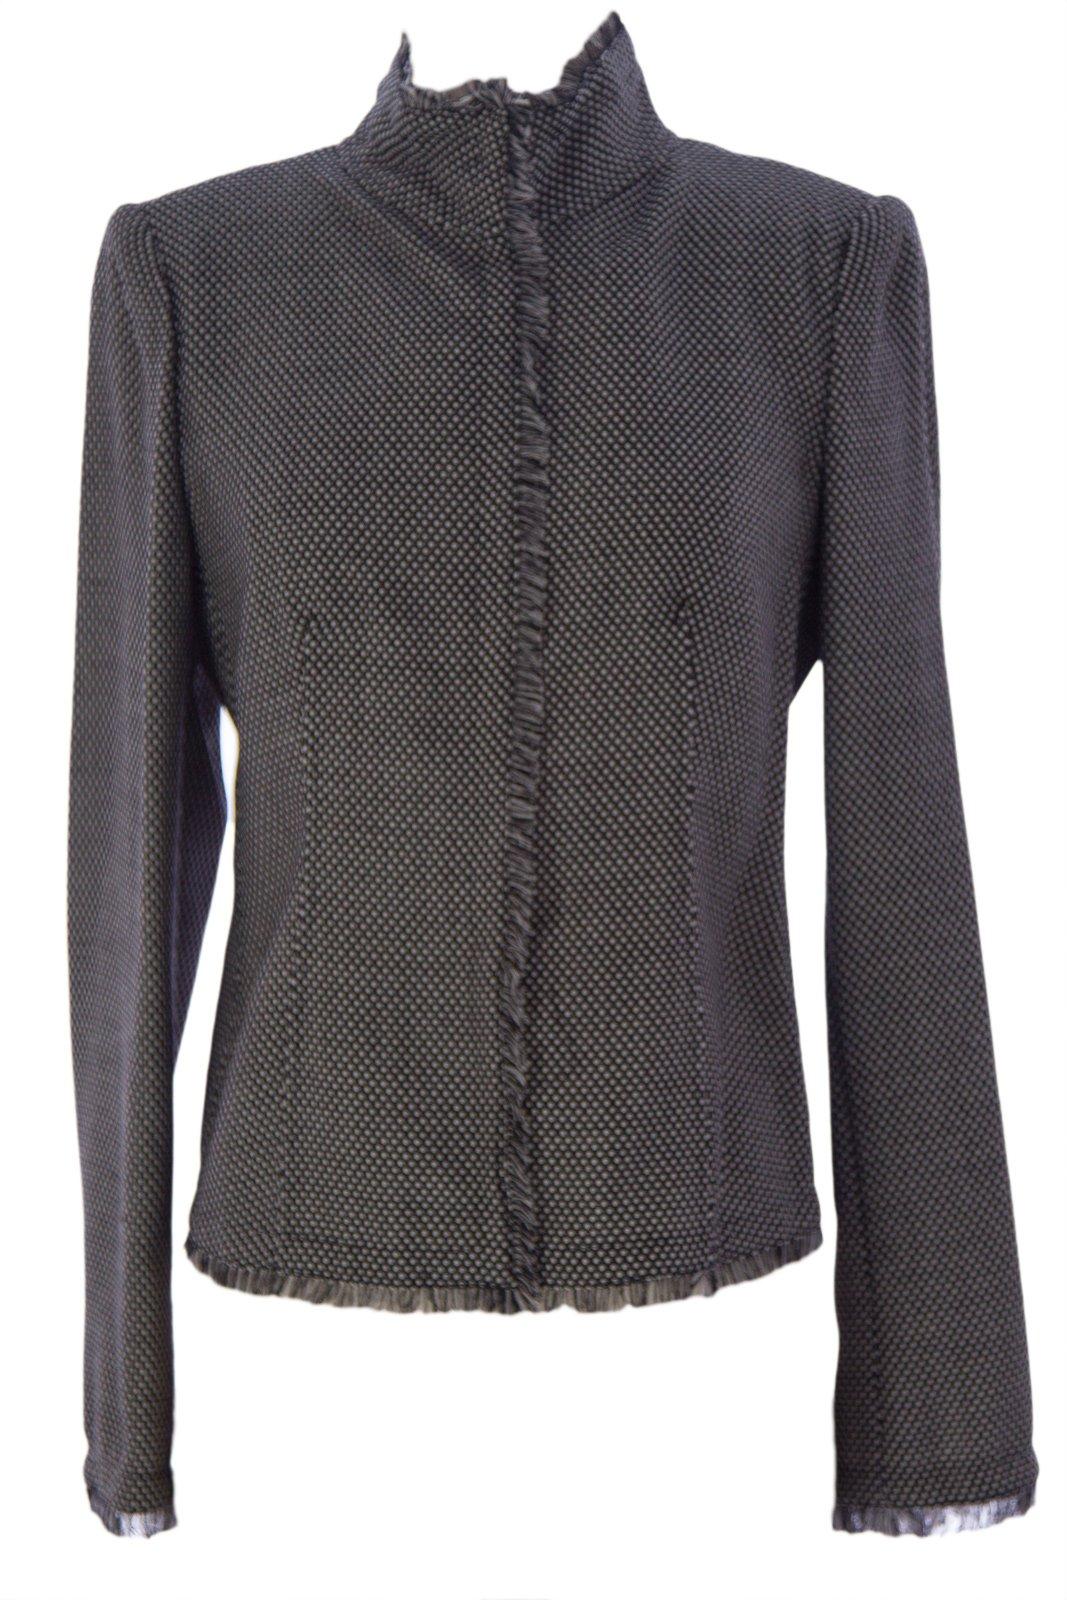 Armani Collezioni Women's Frayed Knit Blazer 10 Black & White